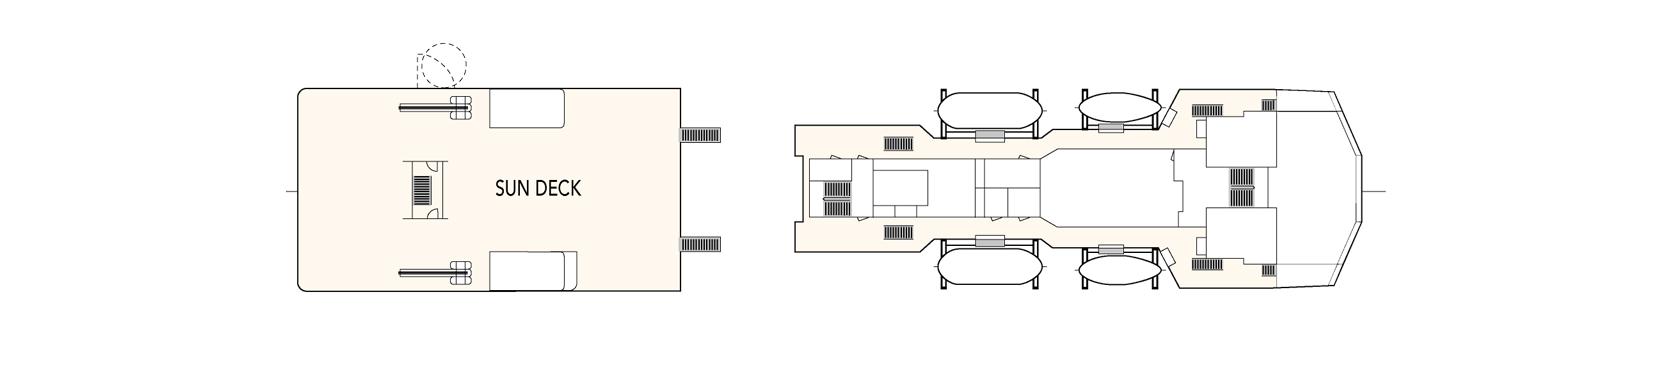 MS Vesterålen-deckplan-Deck F